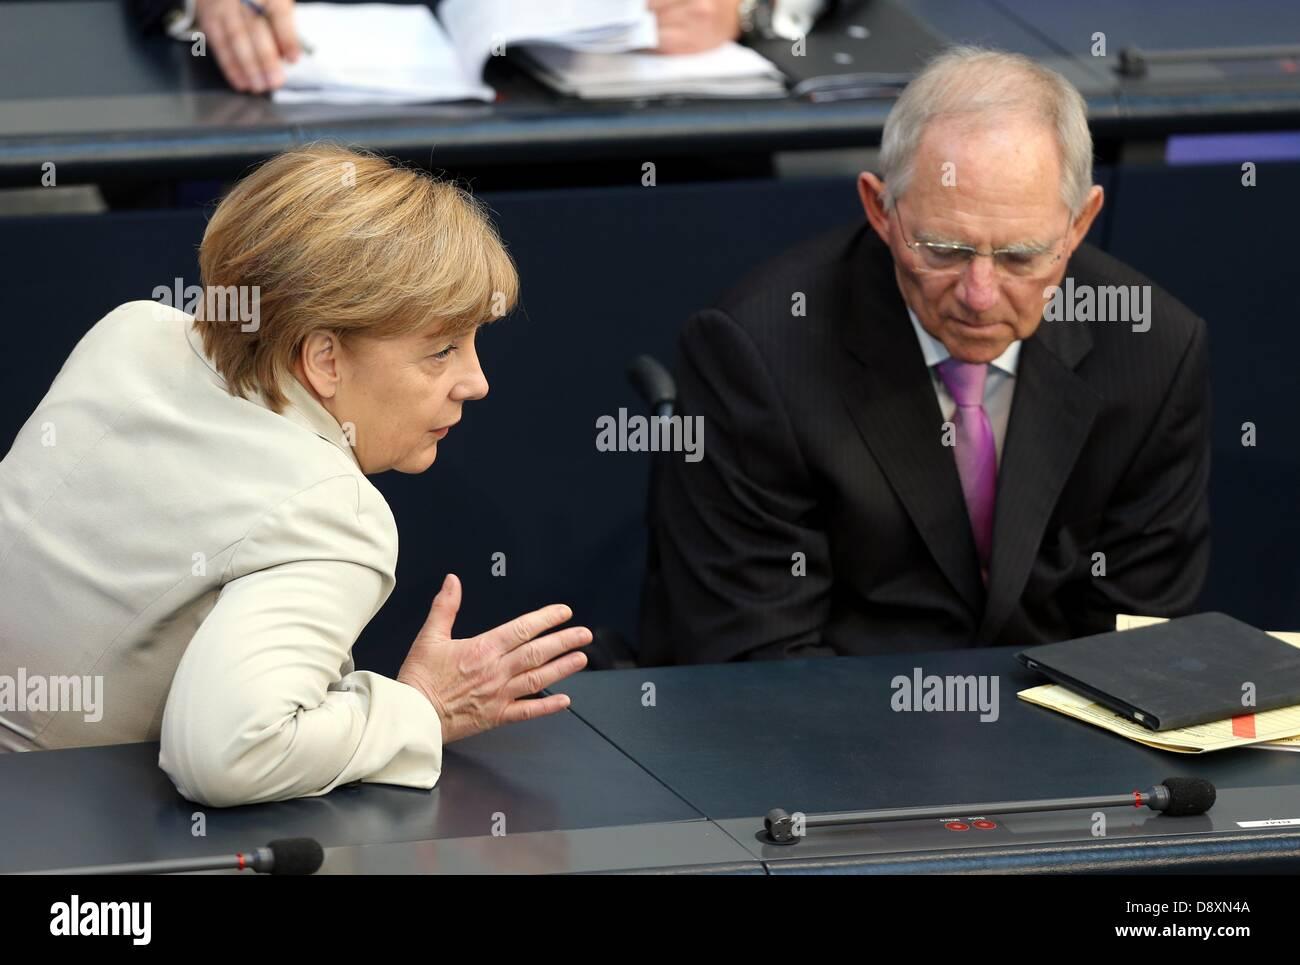 Berlin, Germany. 6th June 2013. Chancellor Angela Merkel talks to German Finance Minister Wolfgang Schäuble - Stock Image